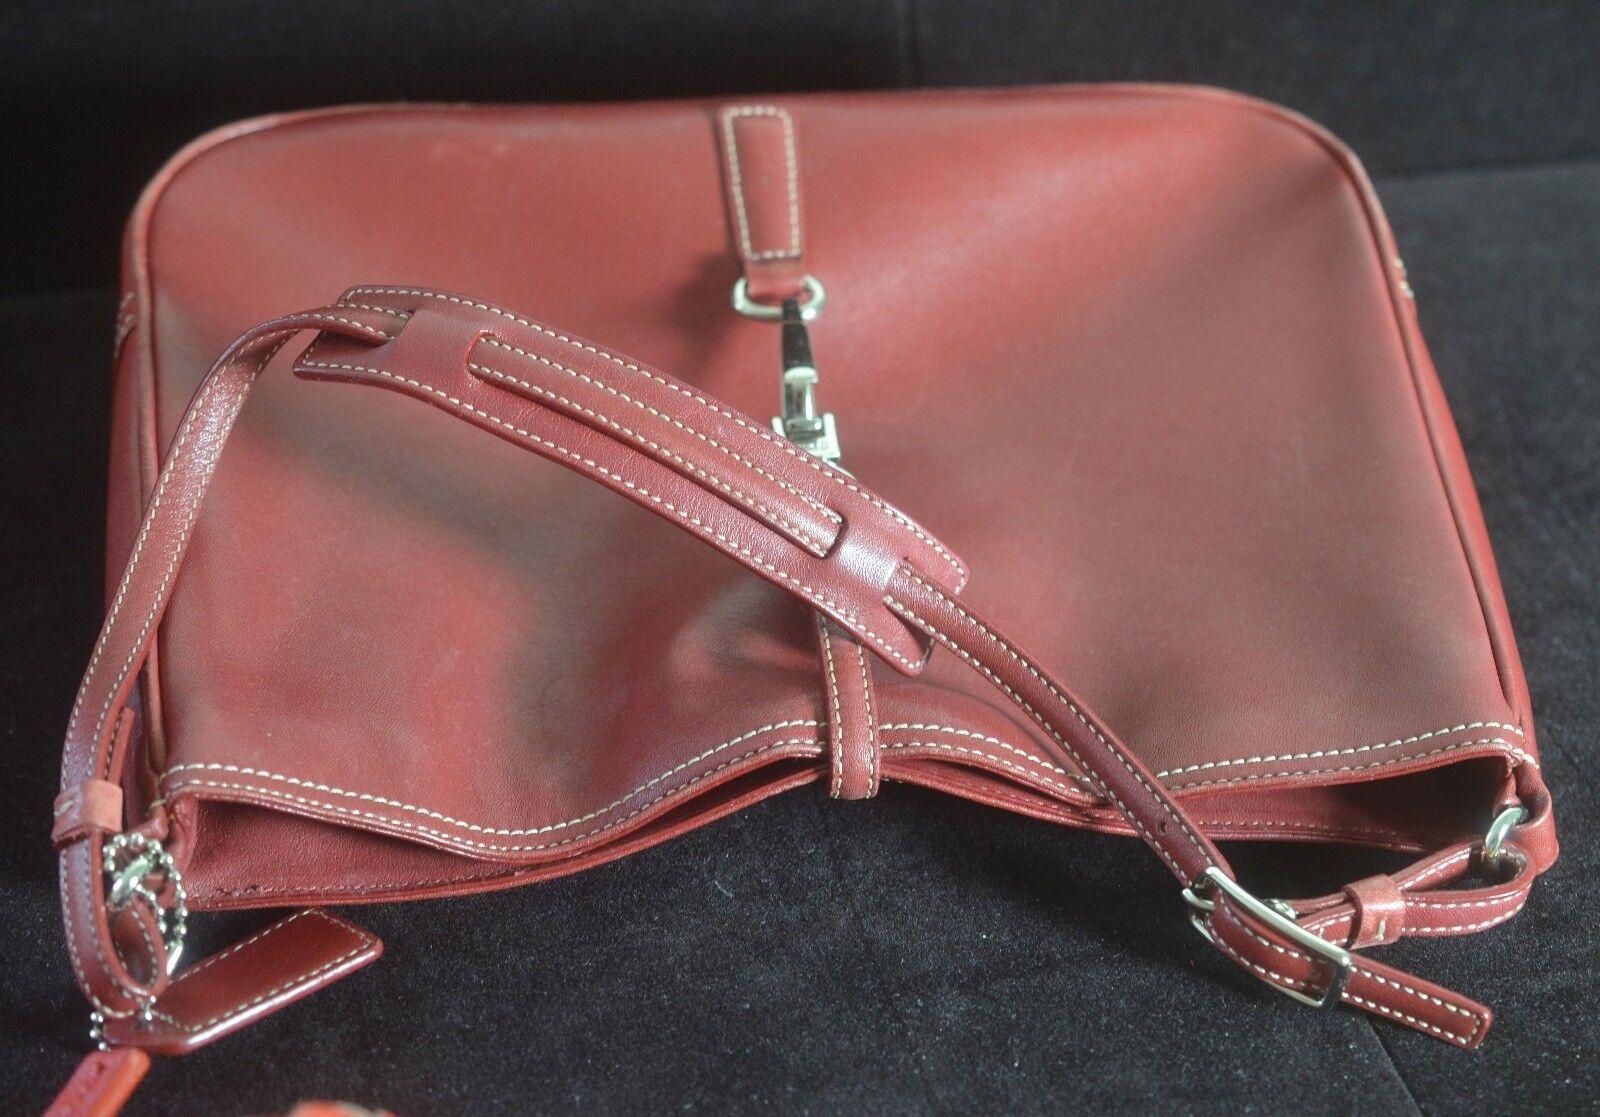 NICE Red Coach Bag Leather Handbag tt940-show original title